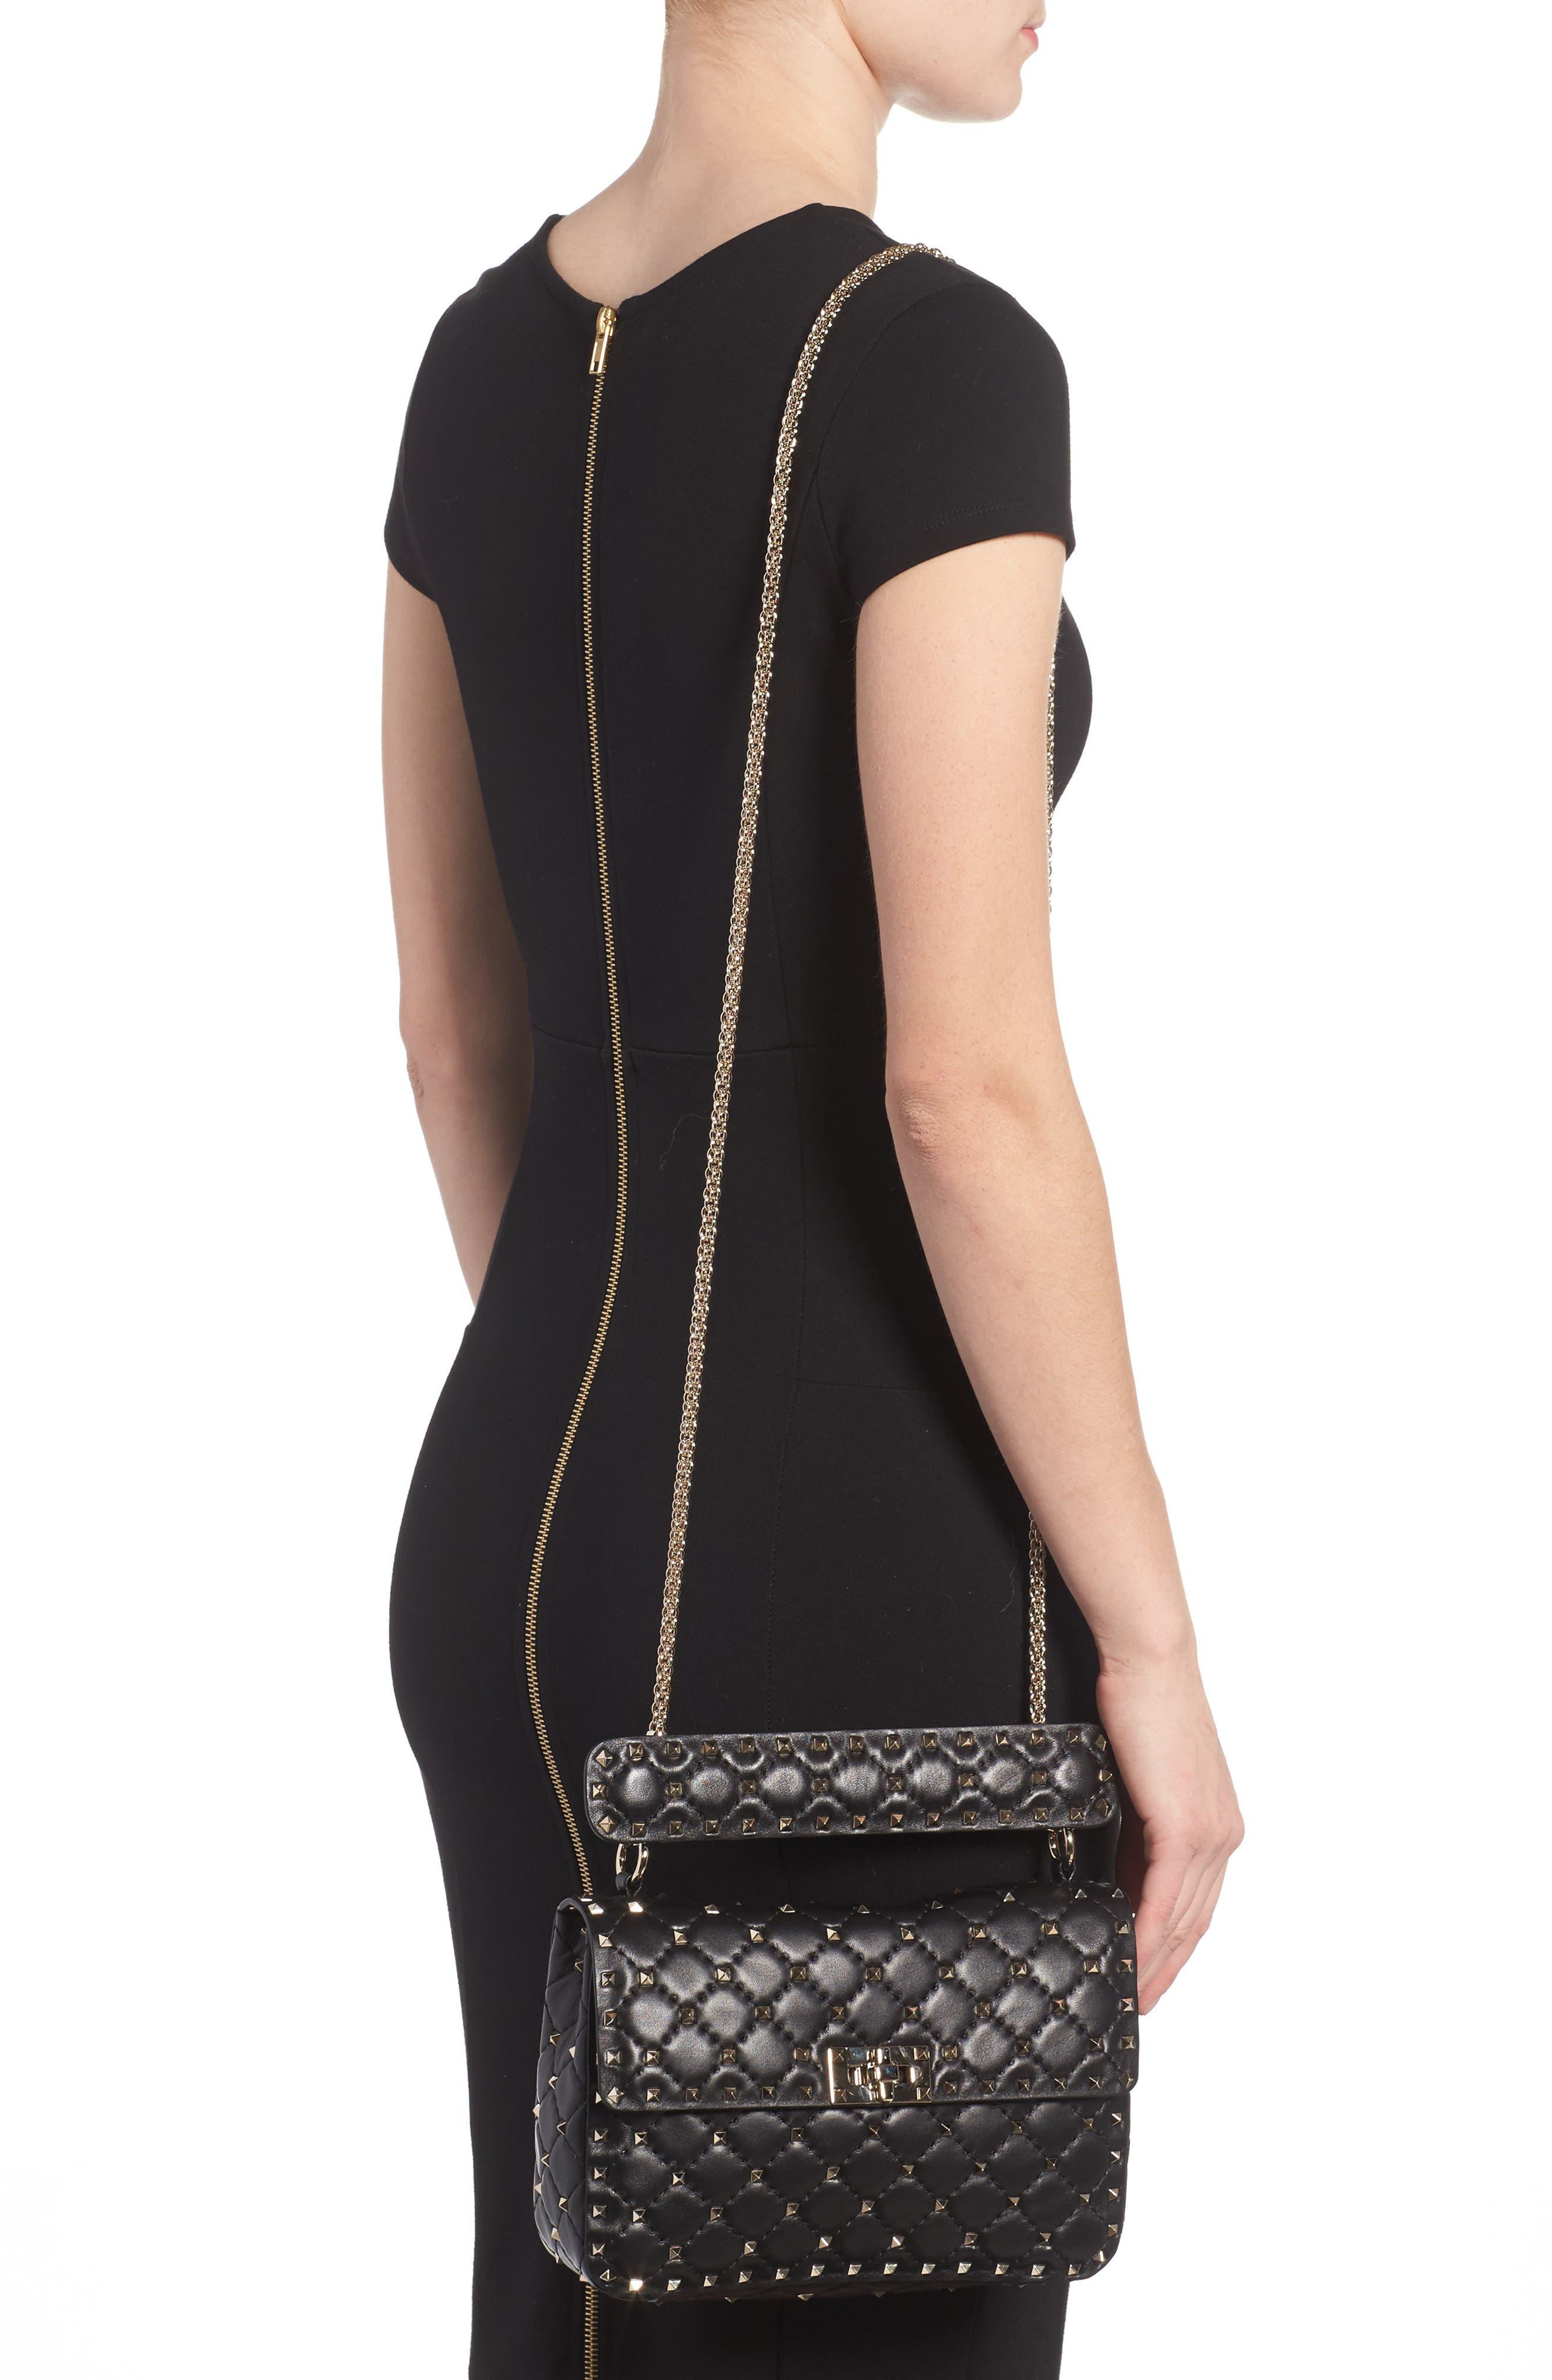 Medium Rockstud Matelassé Quilted Leather Shoulder Bag,                             Alternate thumbnail 2, color,                             BLACK